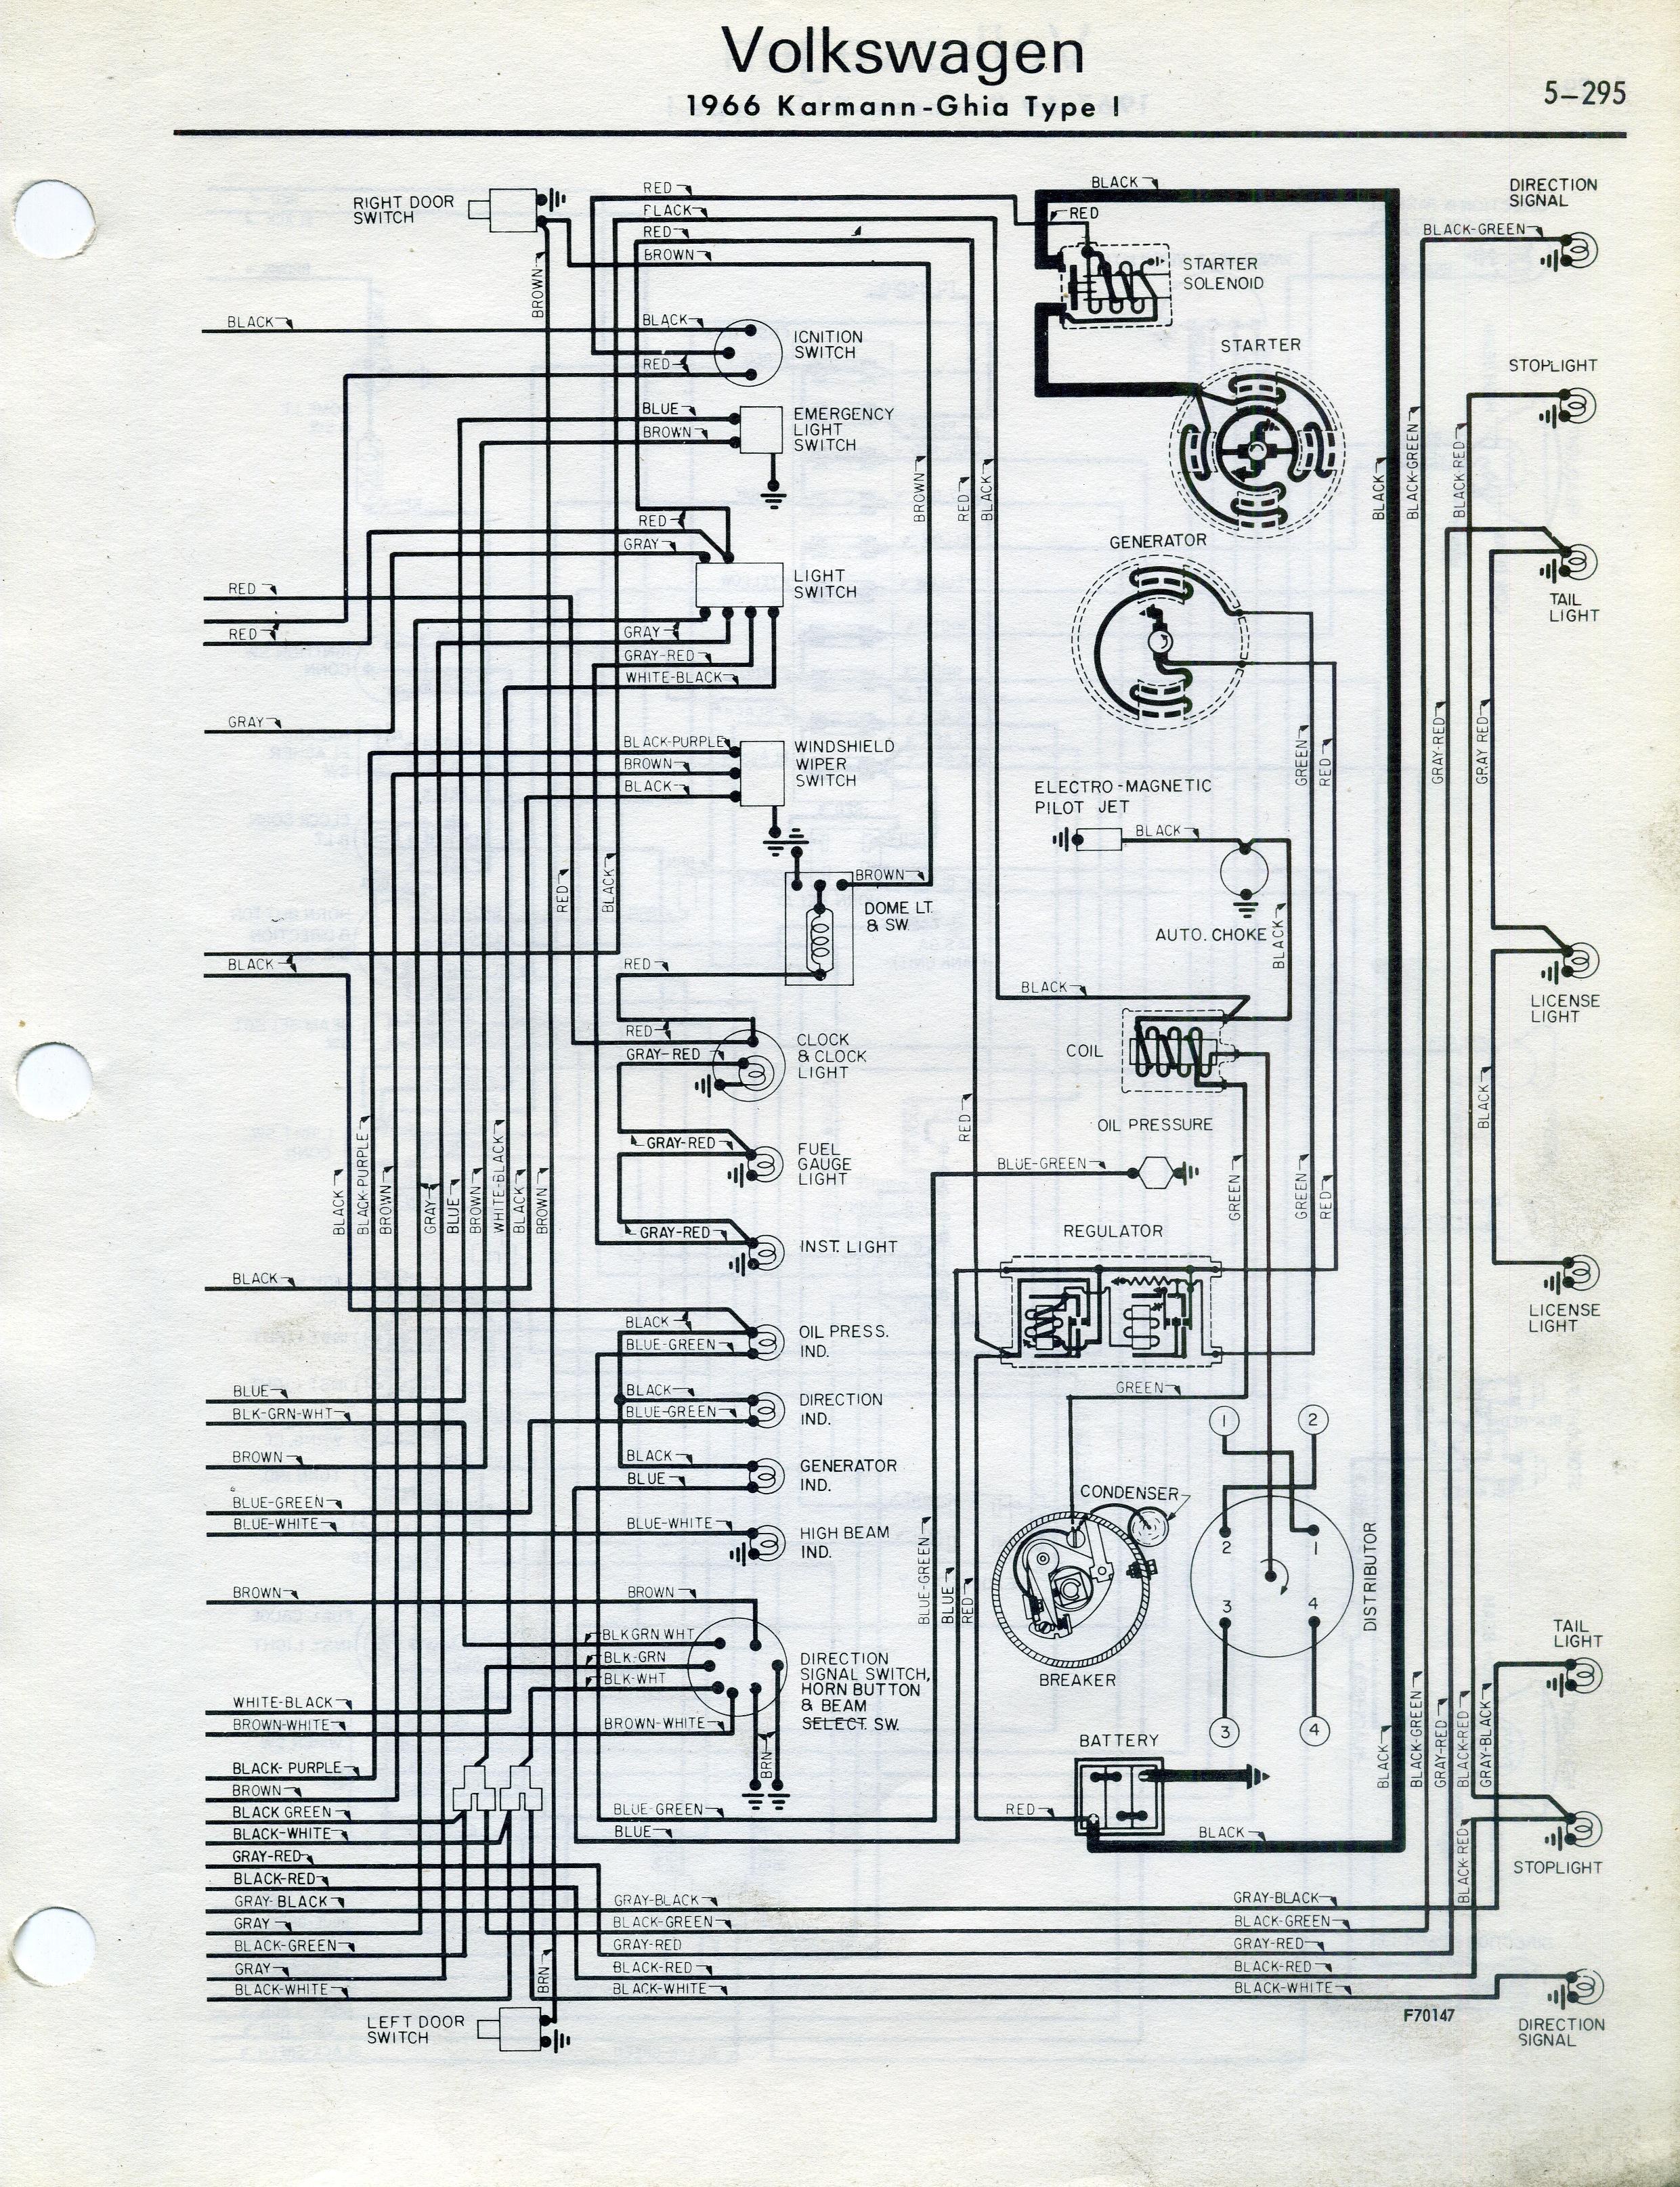 Outstanding Bennett Trim Tab Rocker Wiring Diagram Model - Wiring ...